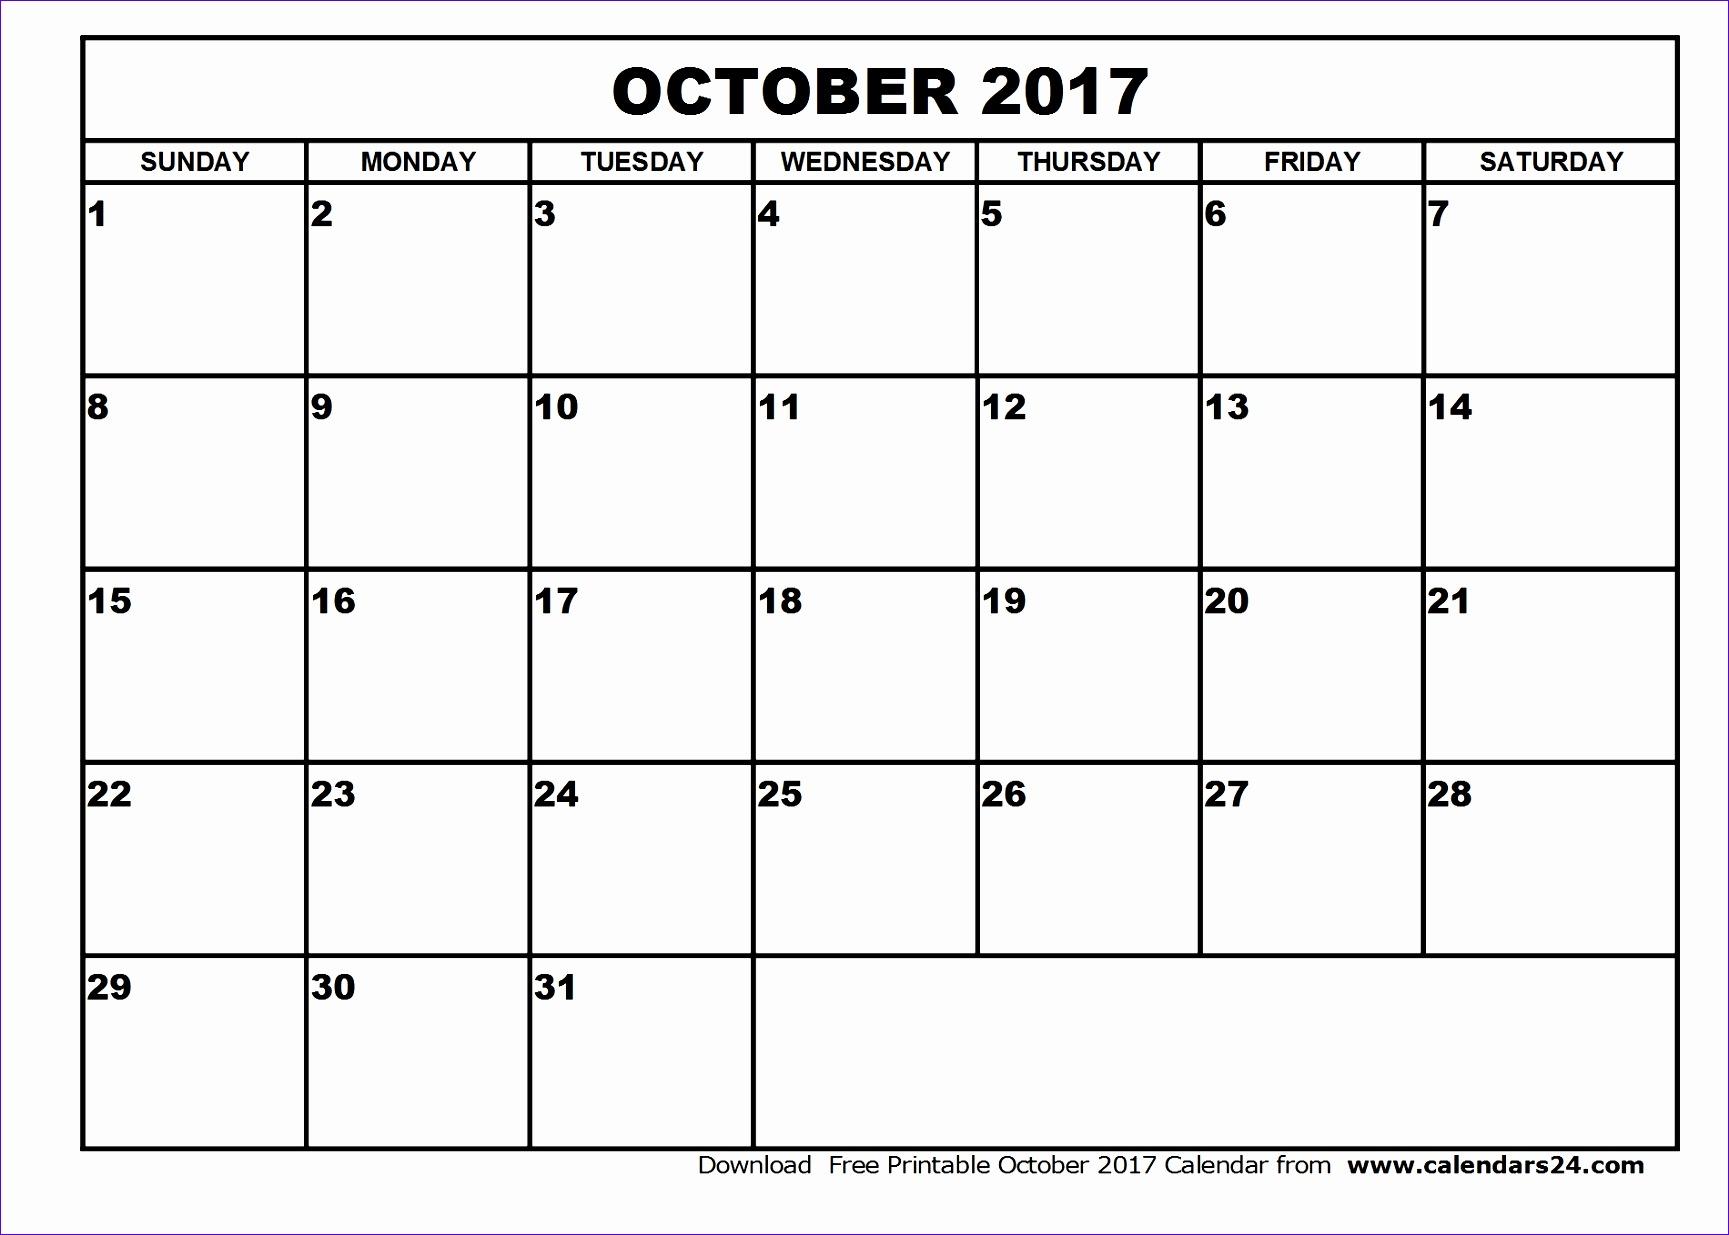 october 2017 calendar 3708 17291235